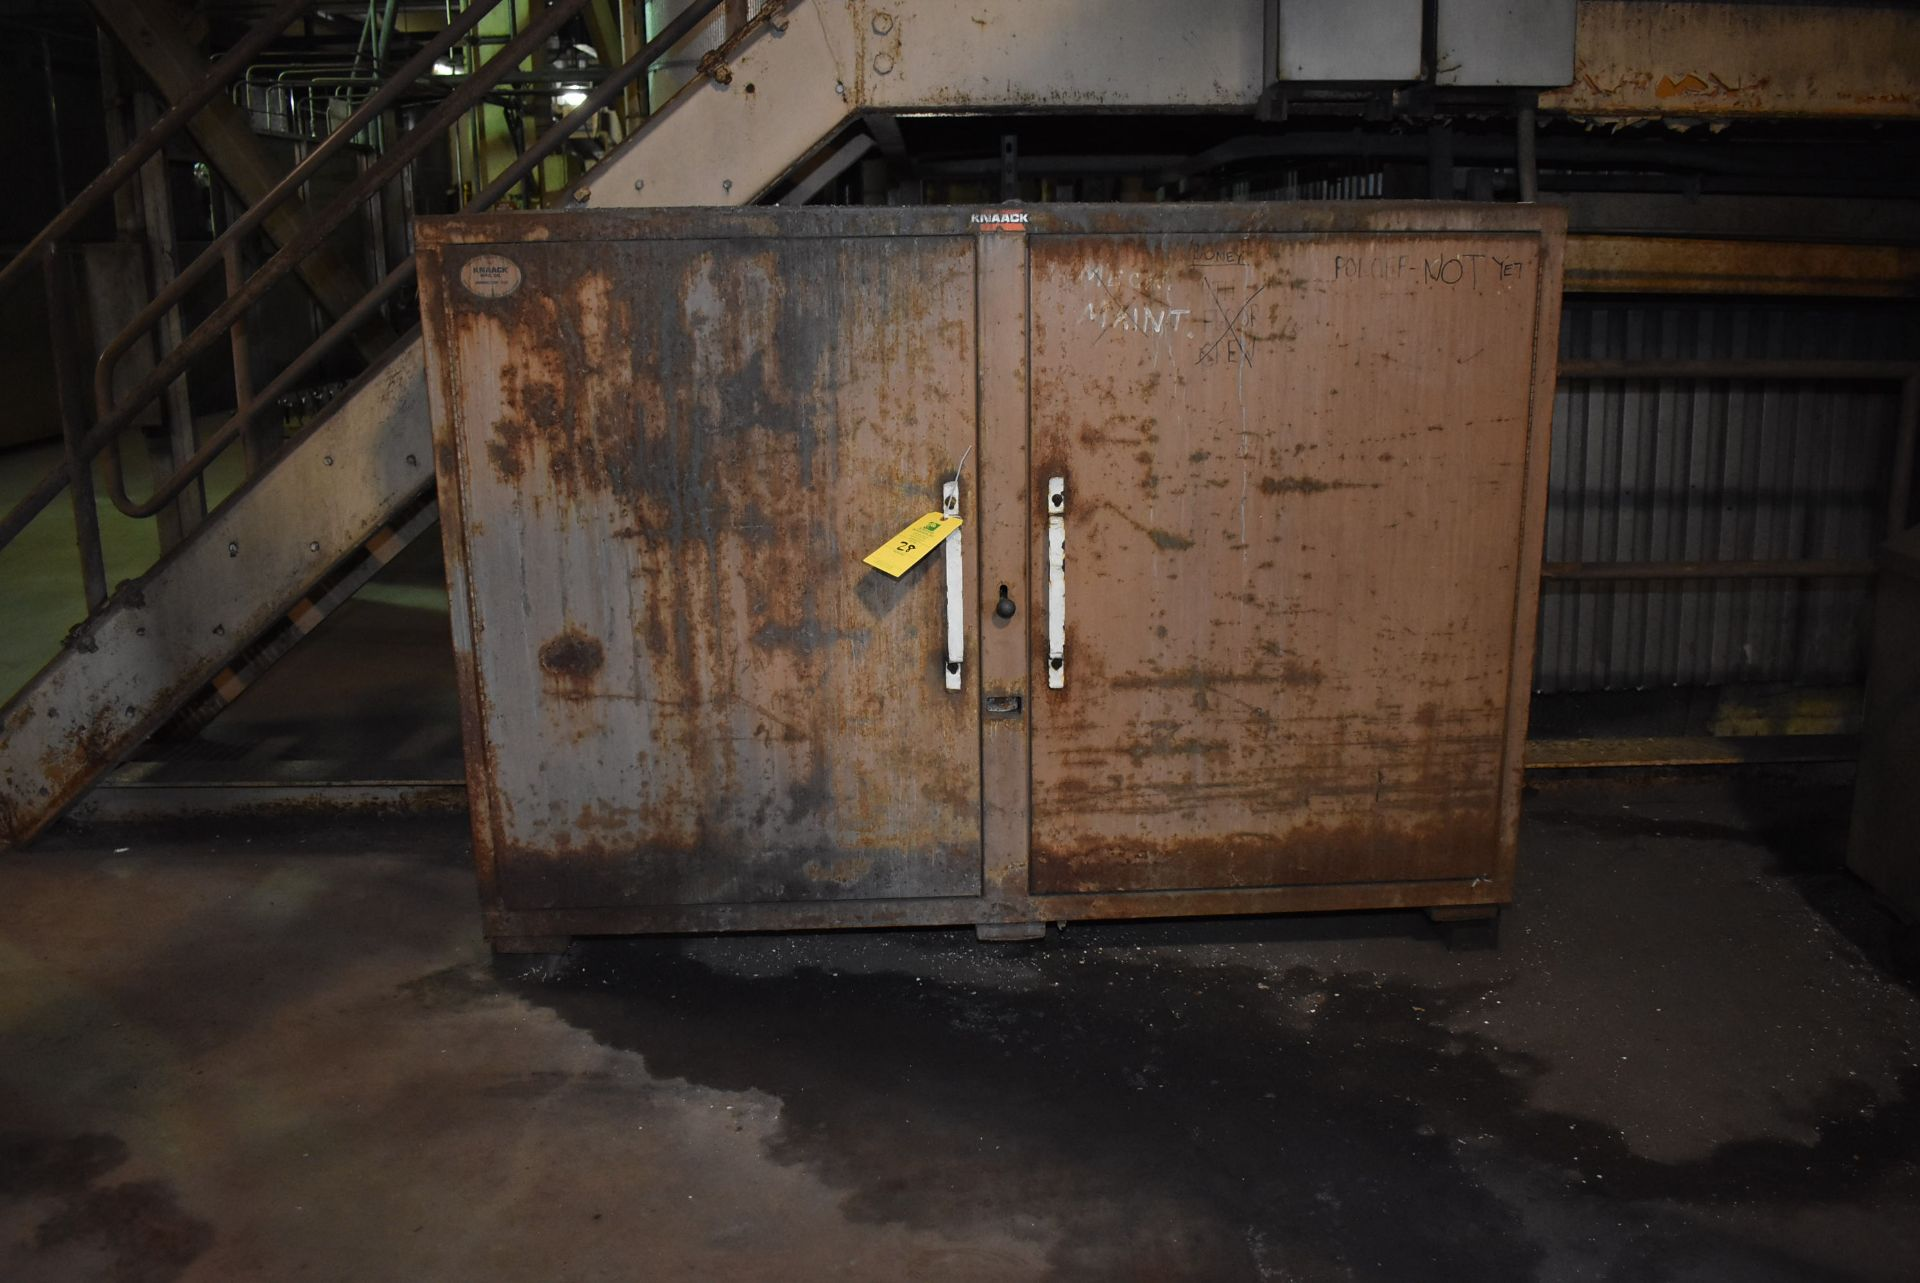 Lot 28 - Knaack Jobmaster 129 Job Box